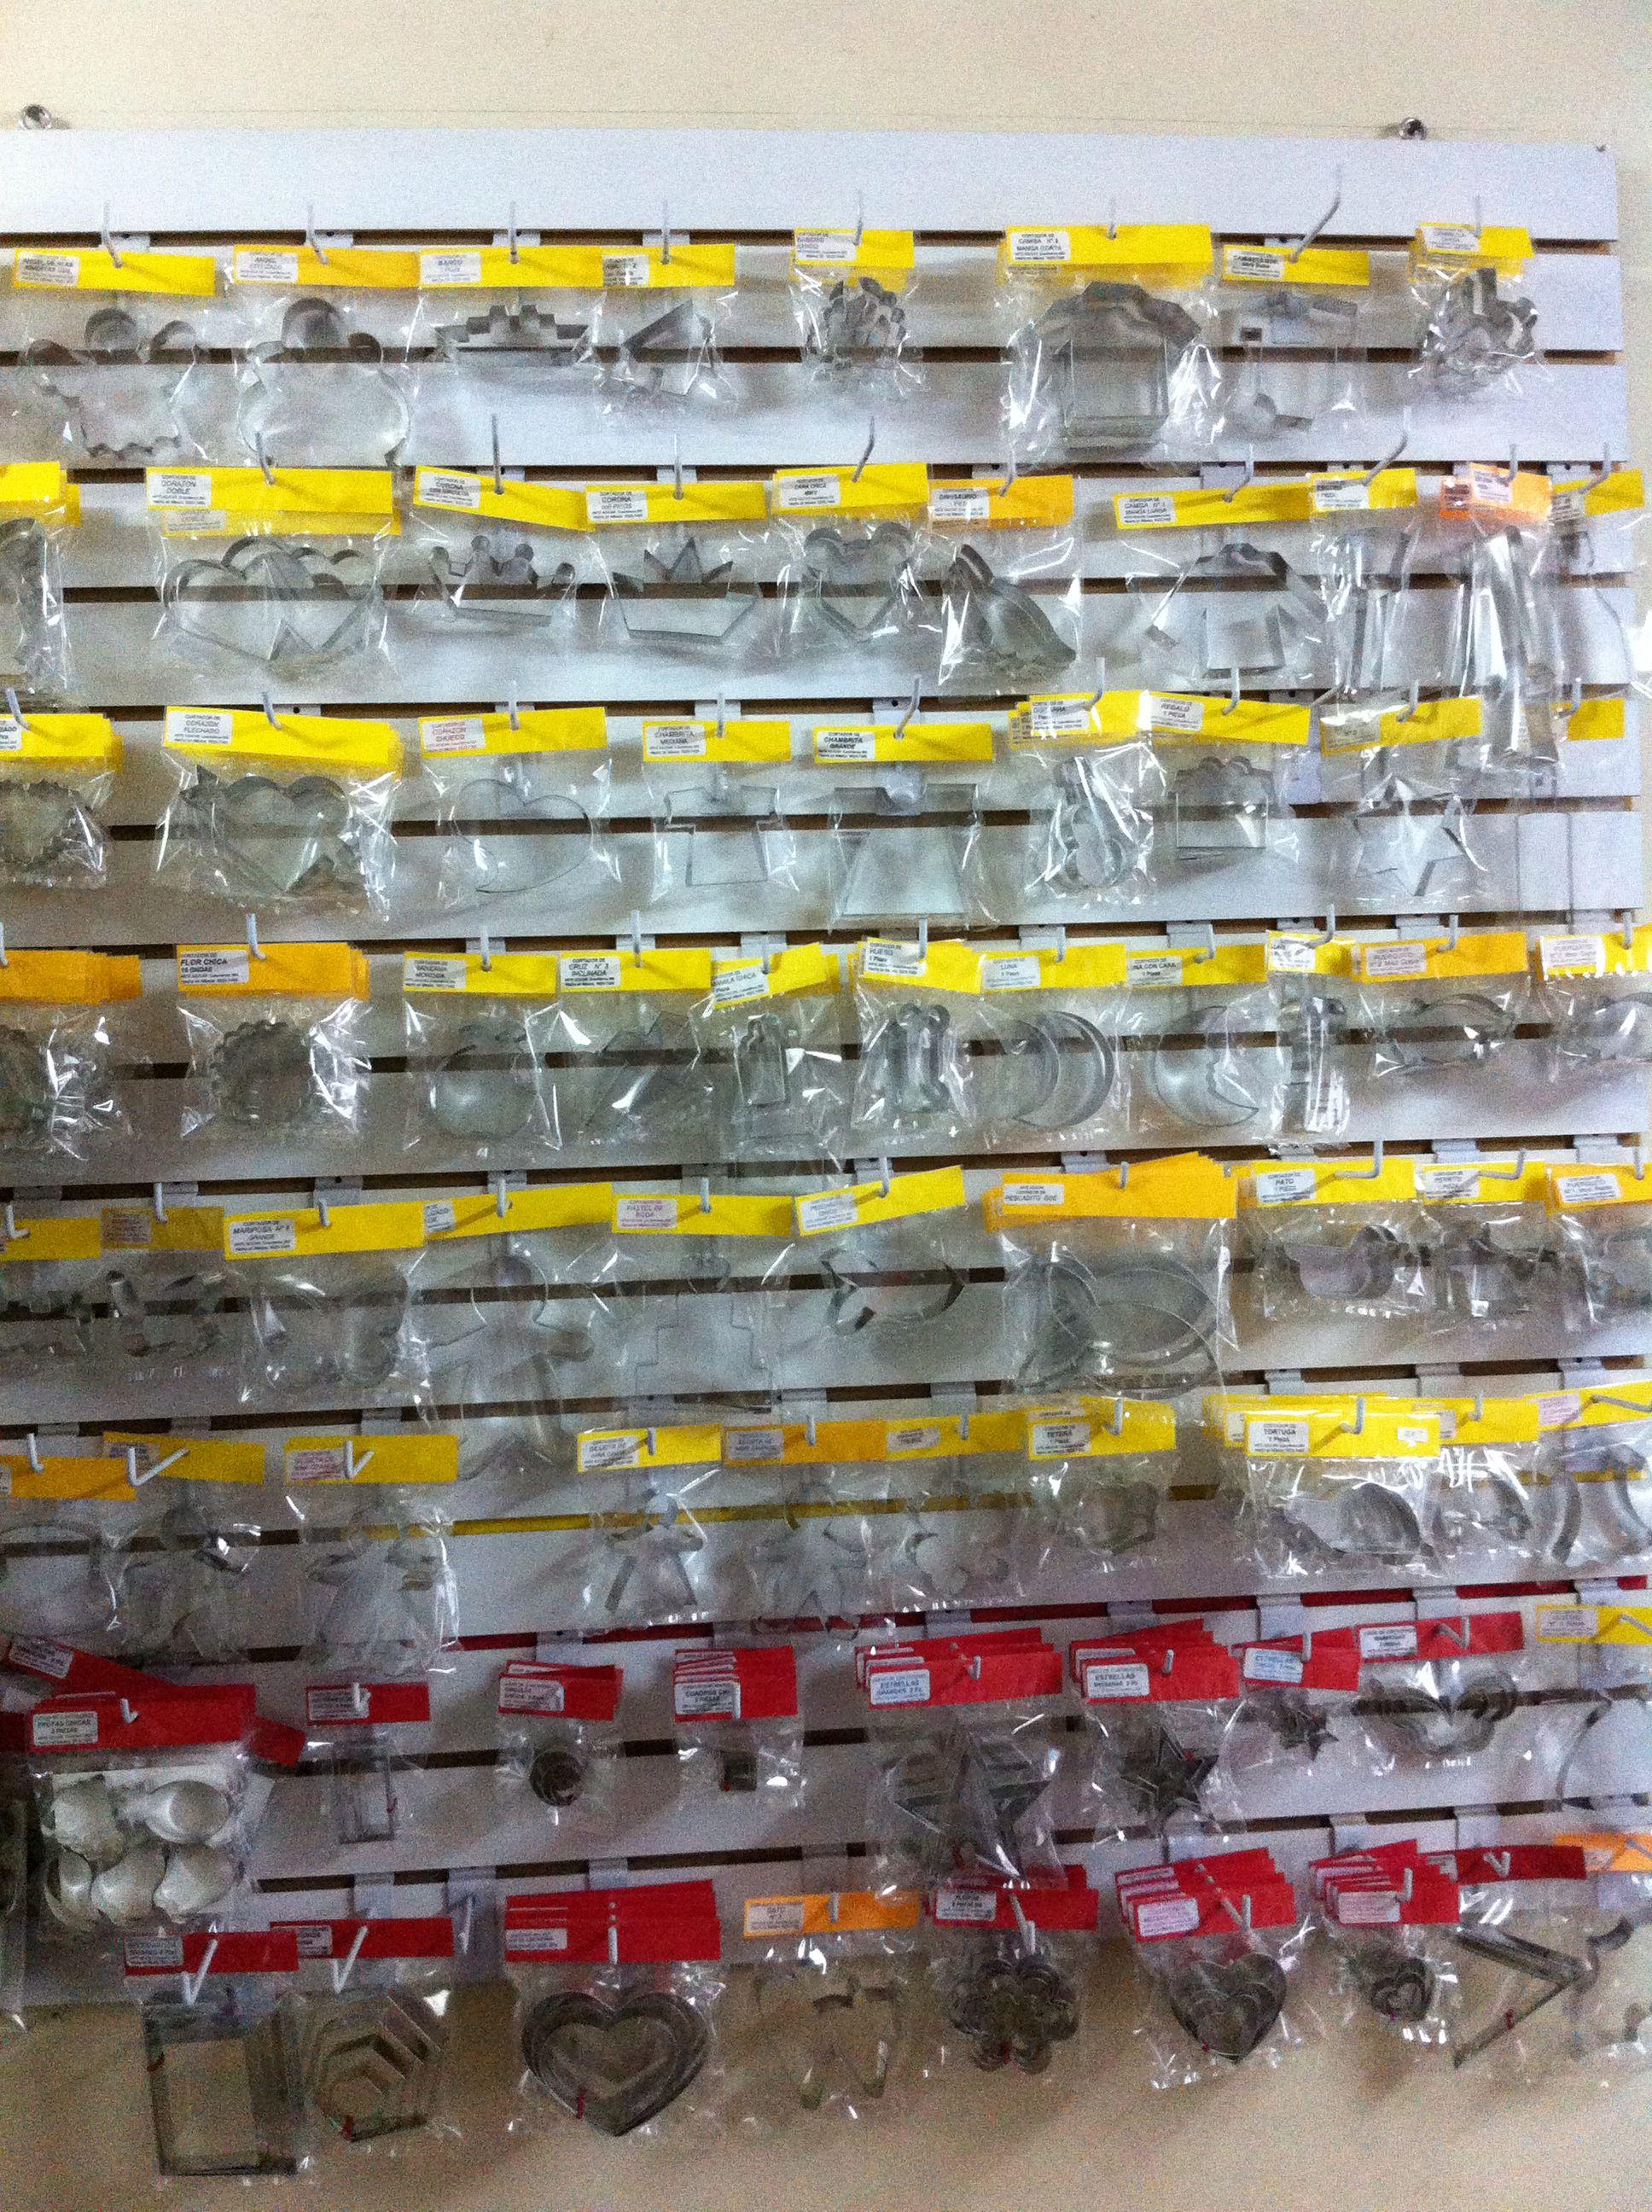 Panel con modelos sencillos de cortadores. Desea informes: México:0155-5523-7493.  Cel:04455-3648-6708.